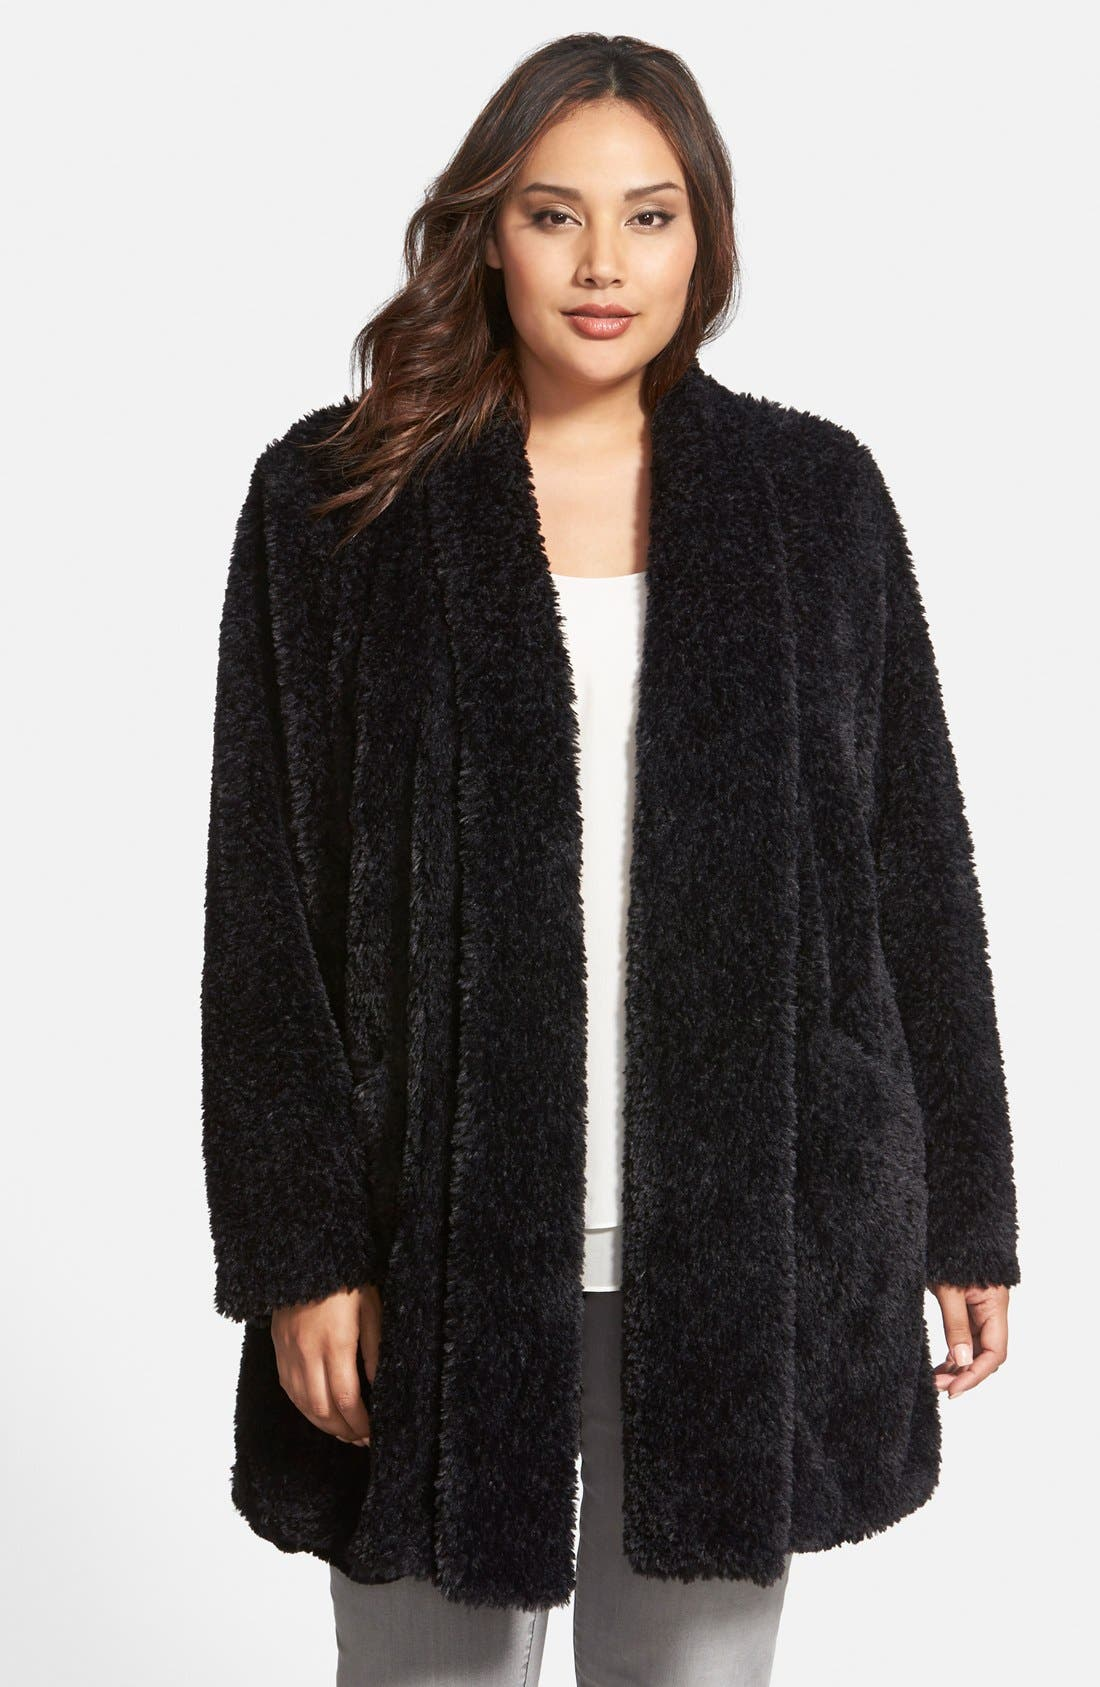 Main Image - Kenneth Cole New York 'Teddy Bear' Faux Fur Clutch Coat (Plus Size)